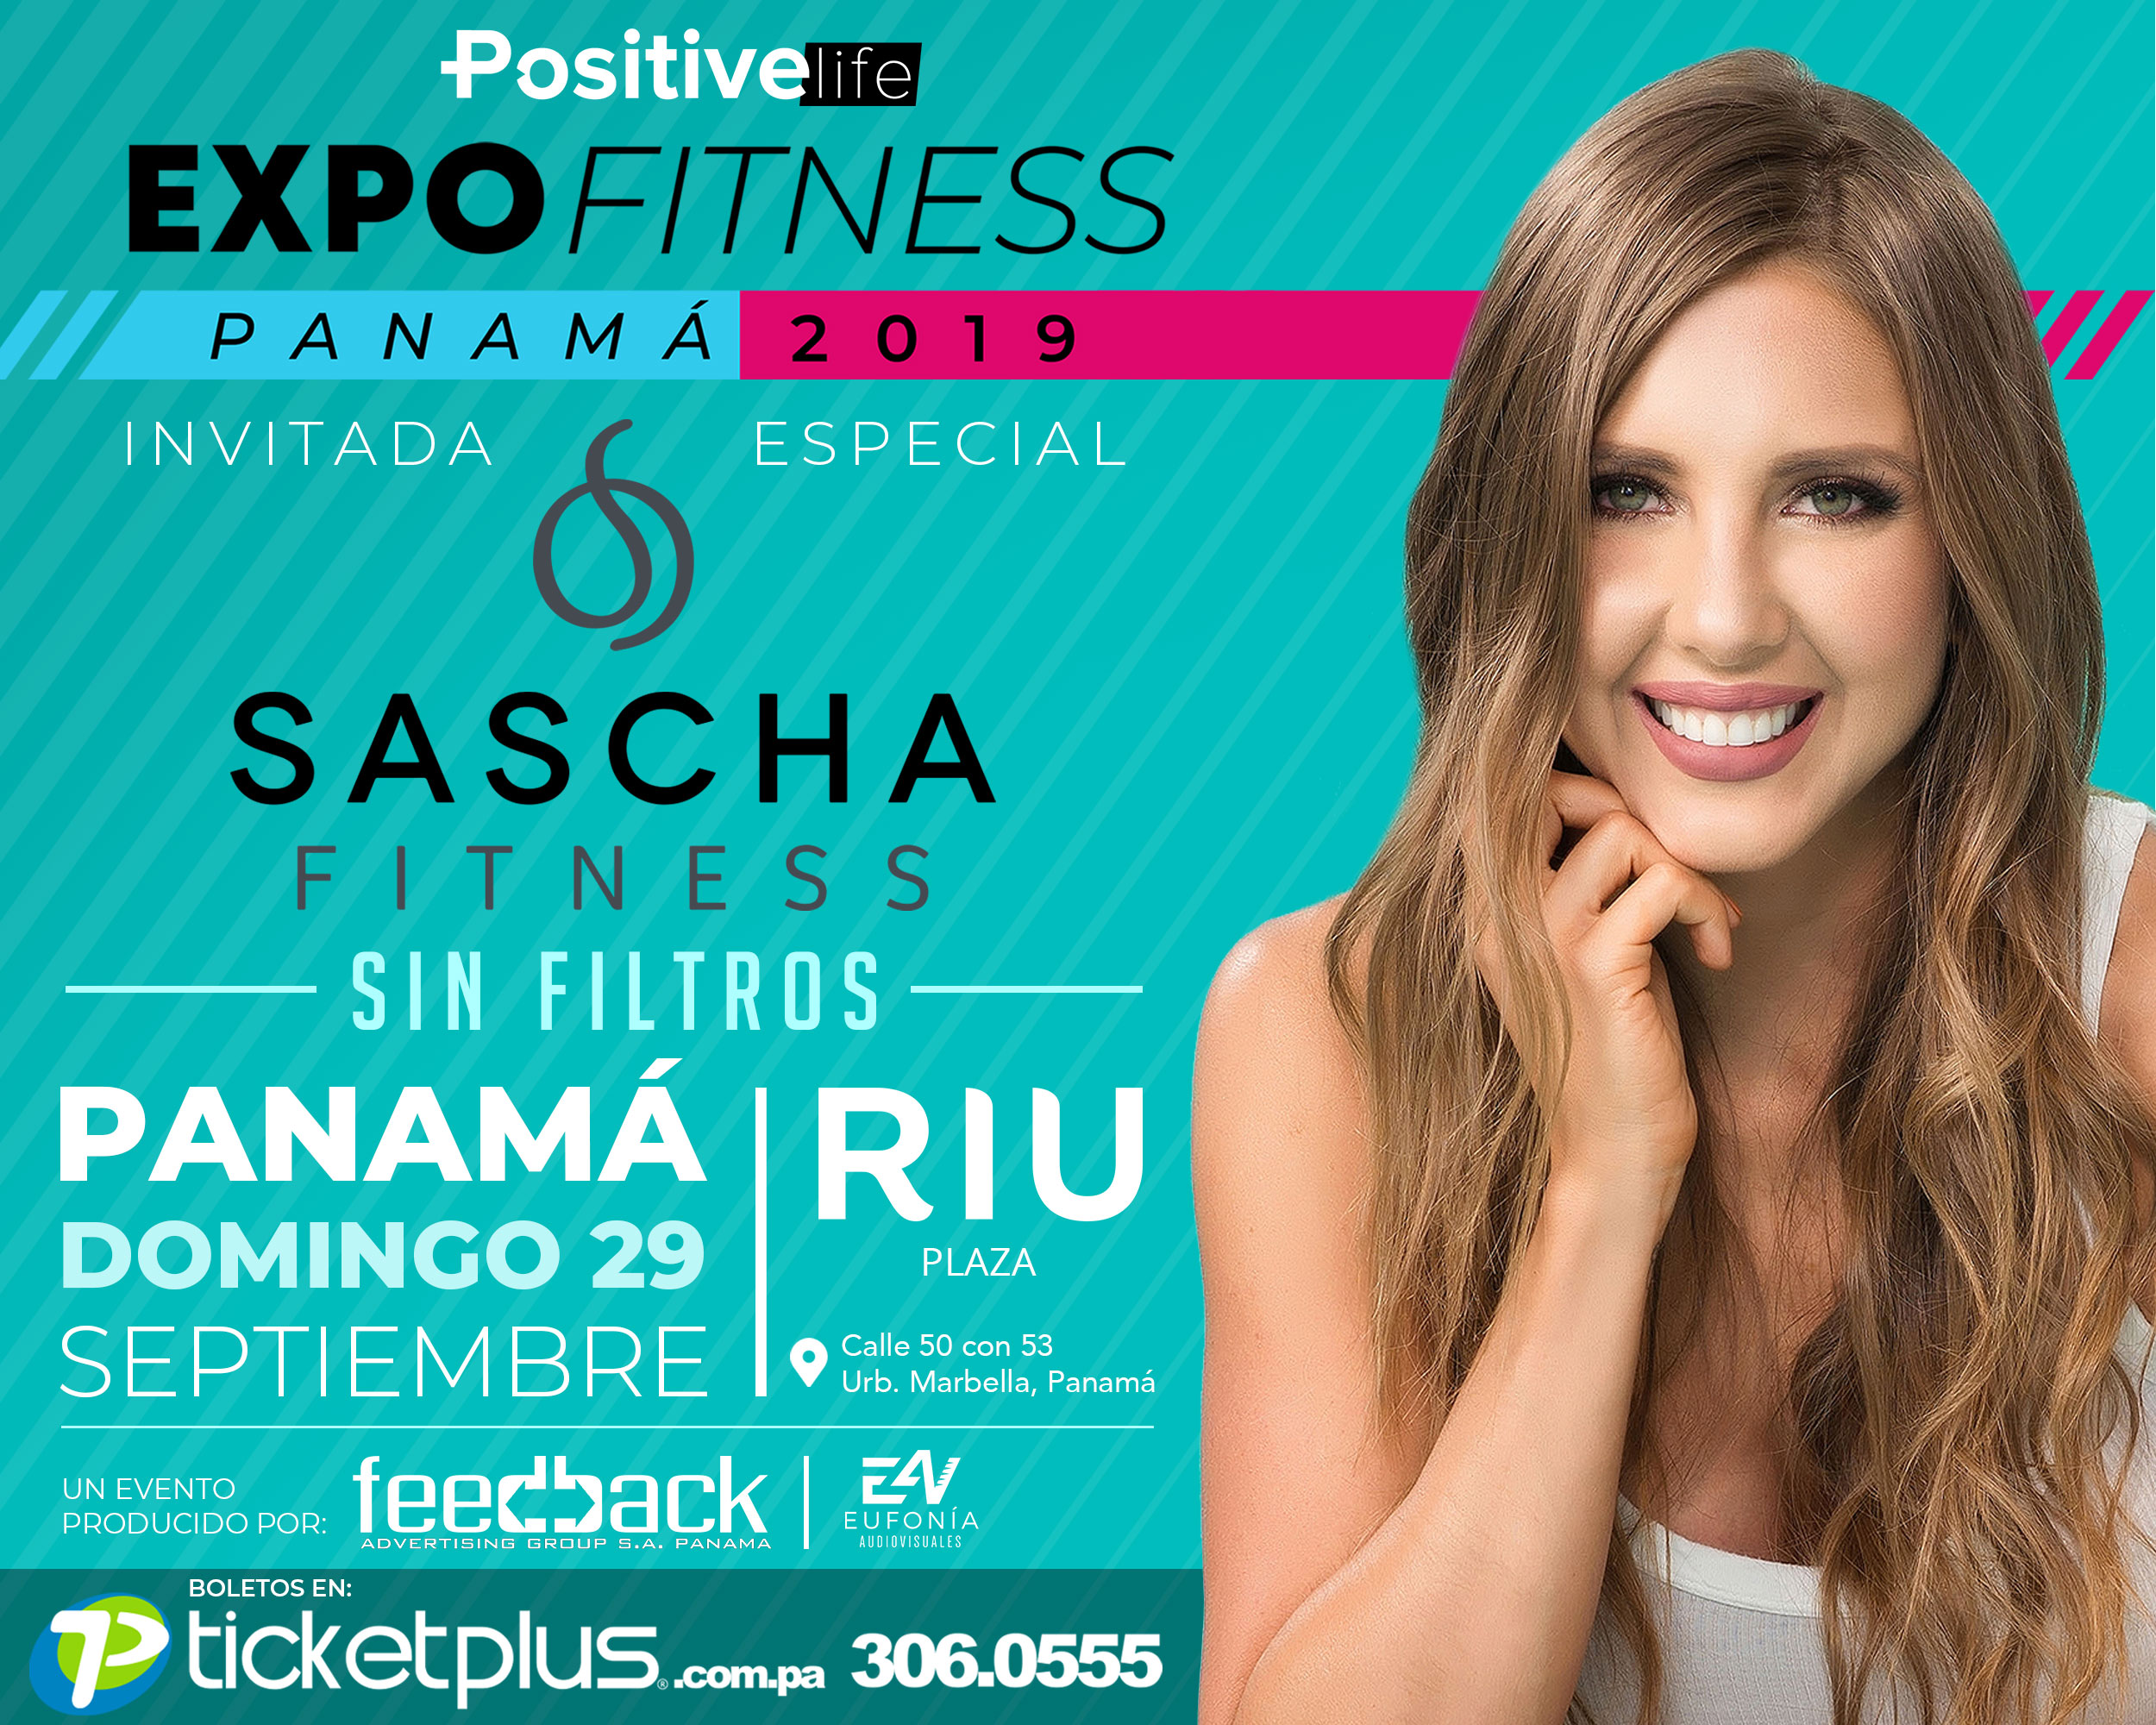 Photo of Sascha Fitness estará en Panamá como invitada especial de la Expo Fitness Panamá 2019